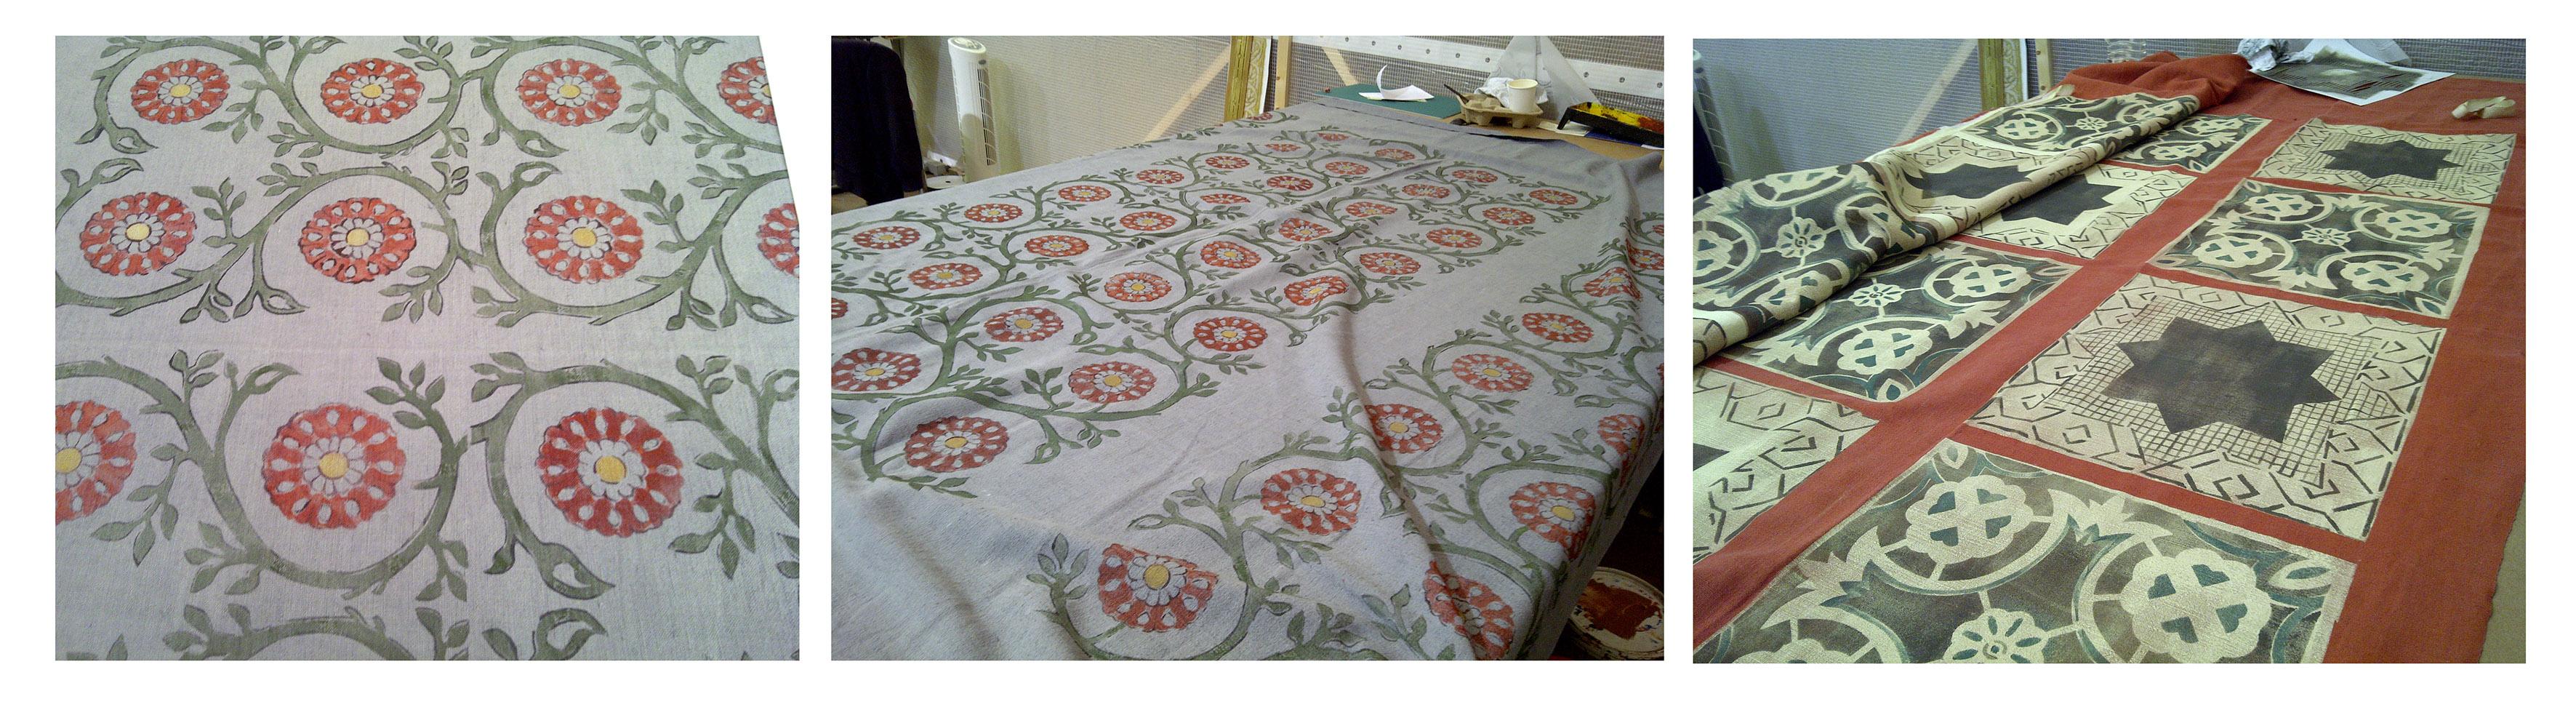 Snow White Blankets